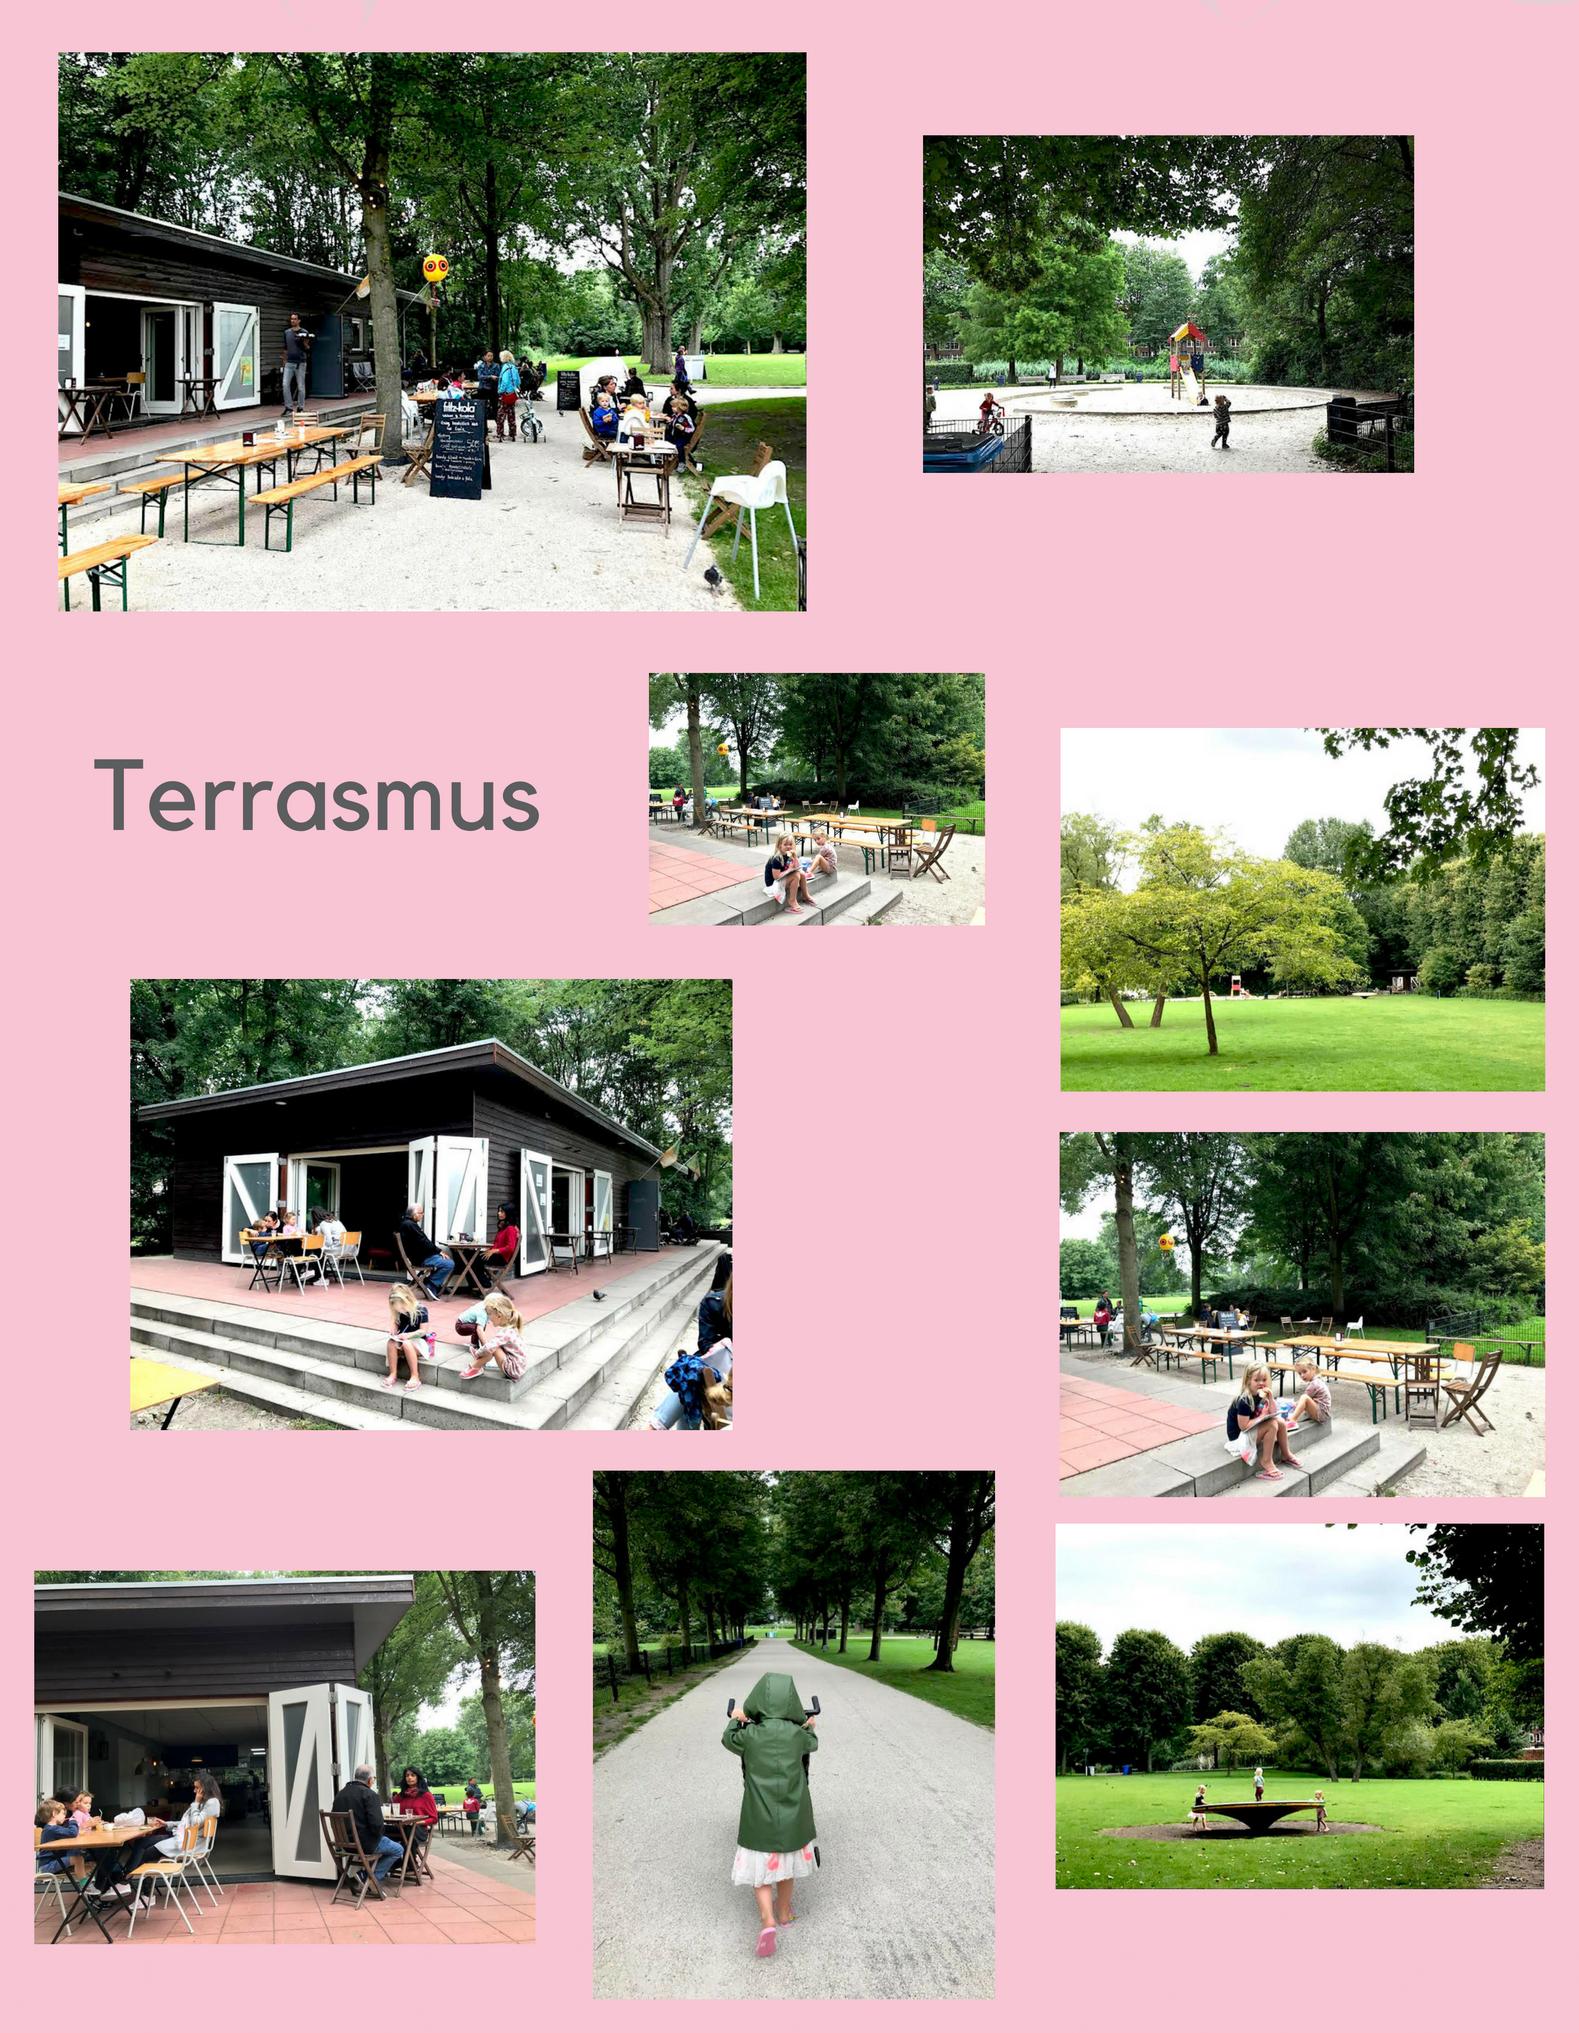 Terasmus Amsterdam